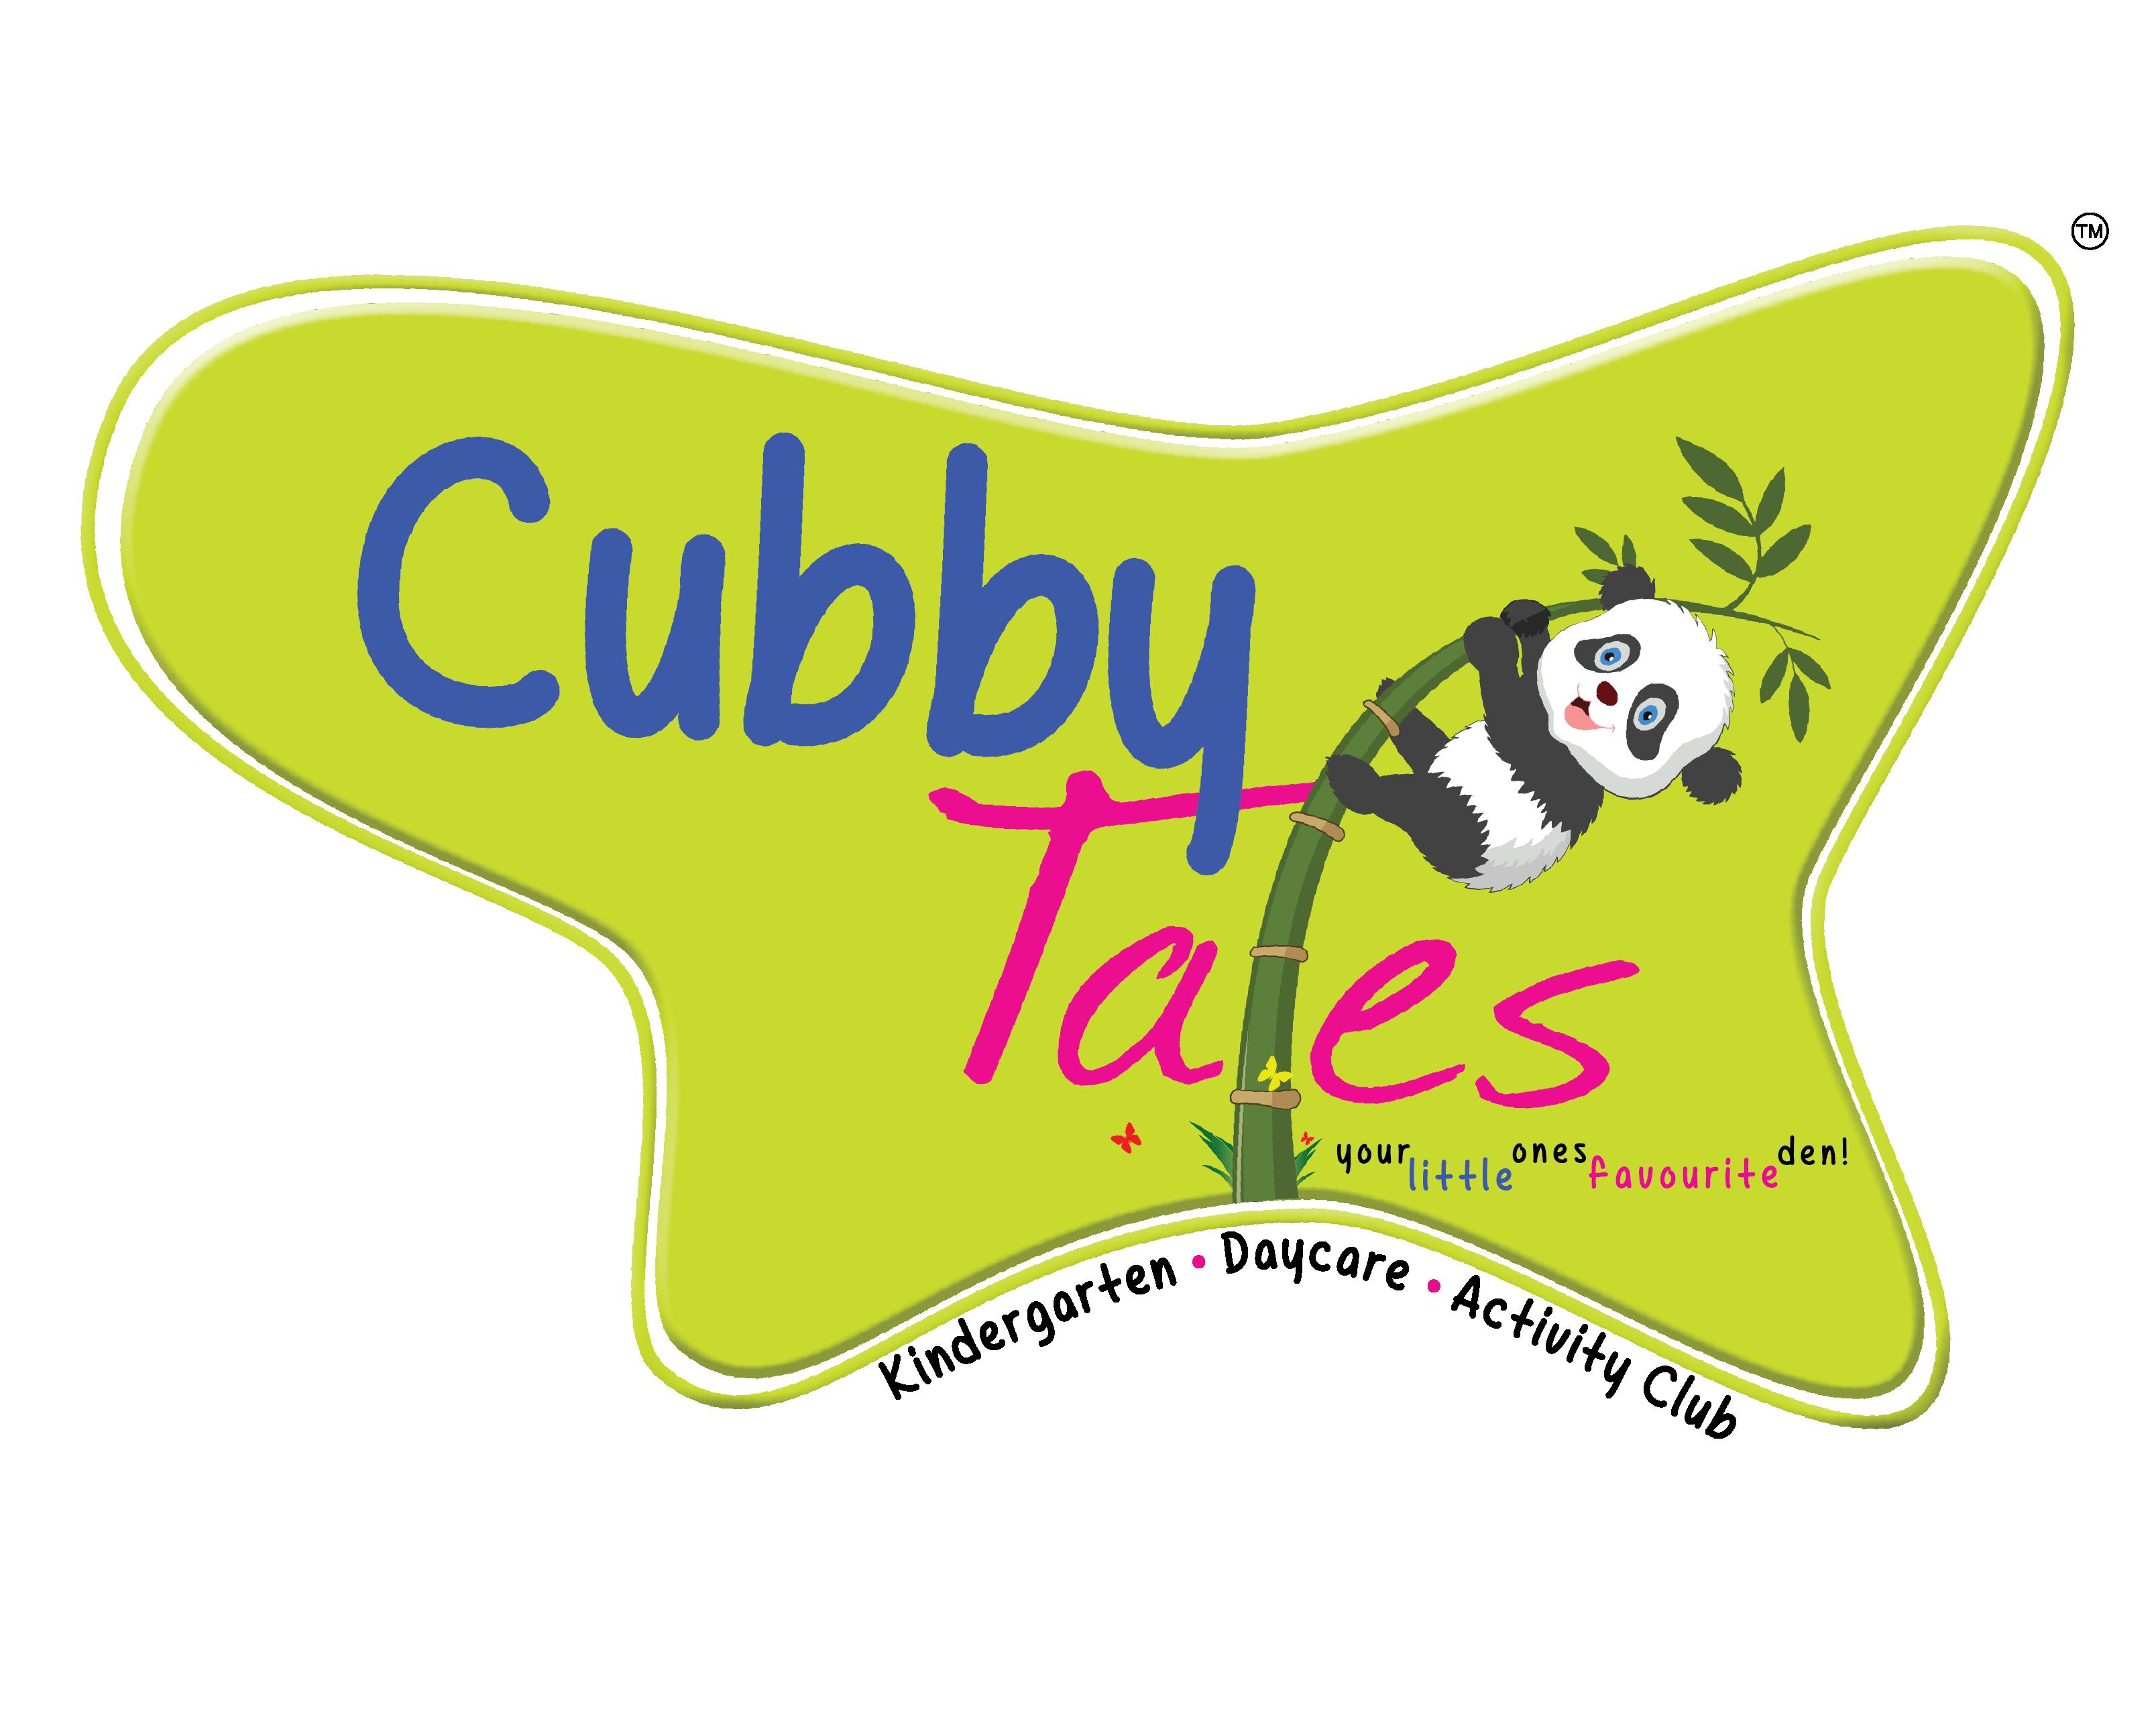 Cubby Tales - Jobs For Women